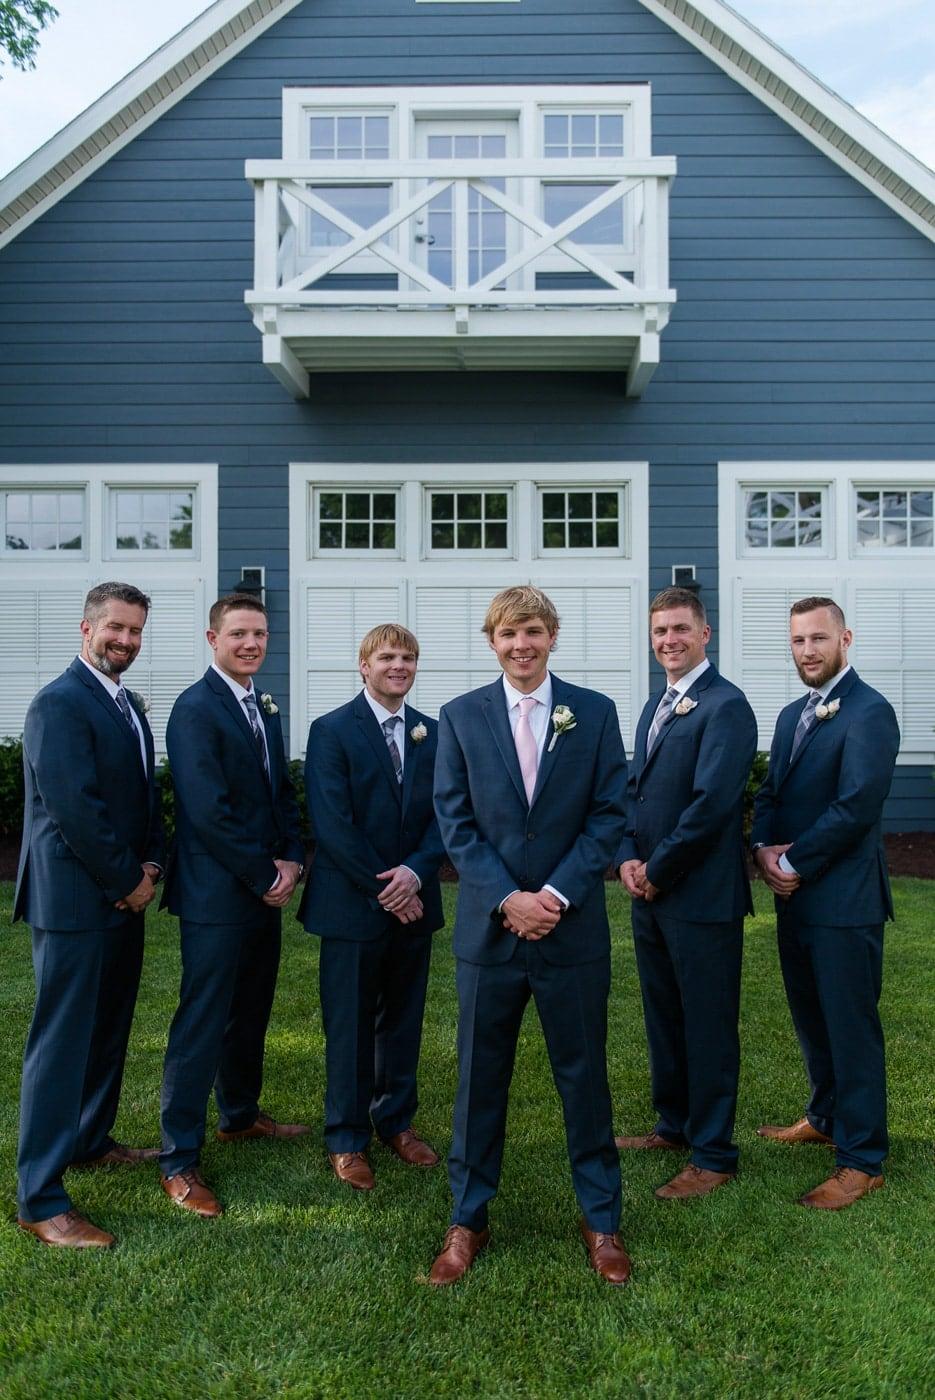 Cool Groomsmen Group Photo